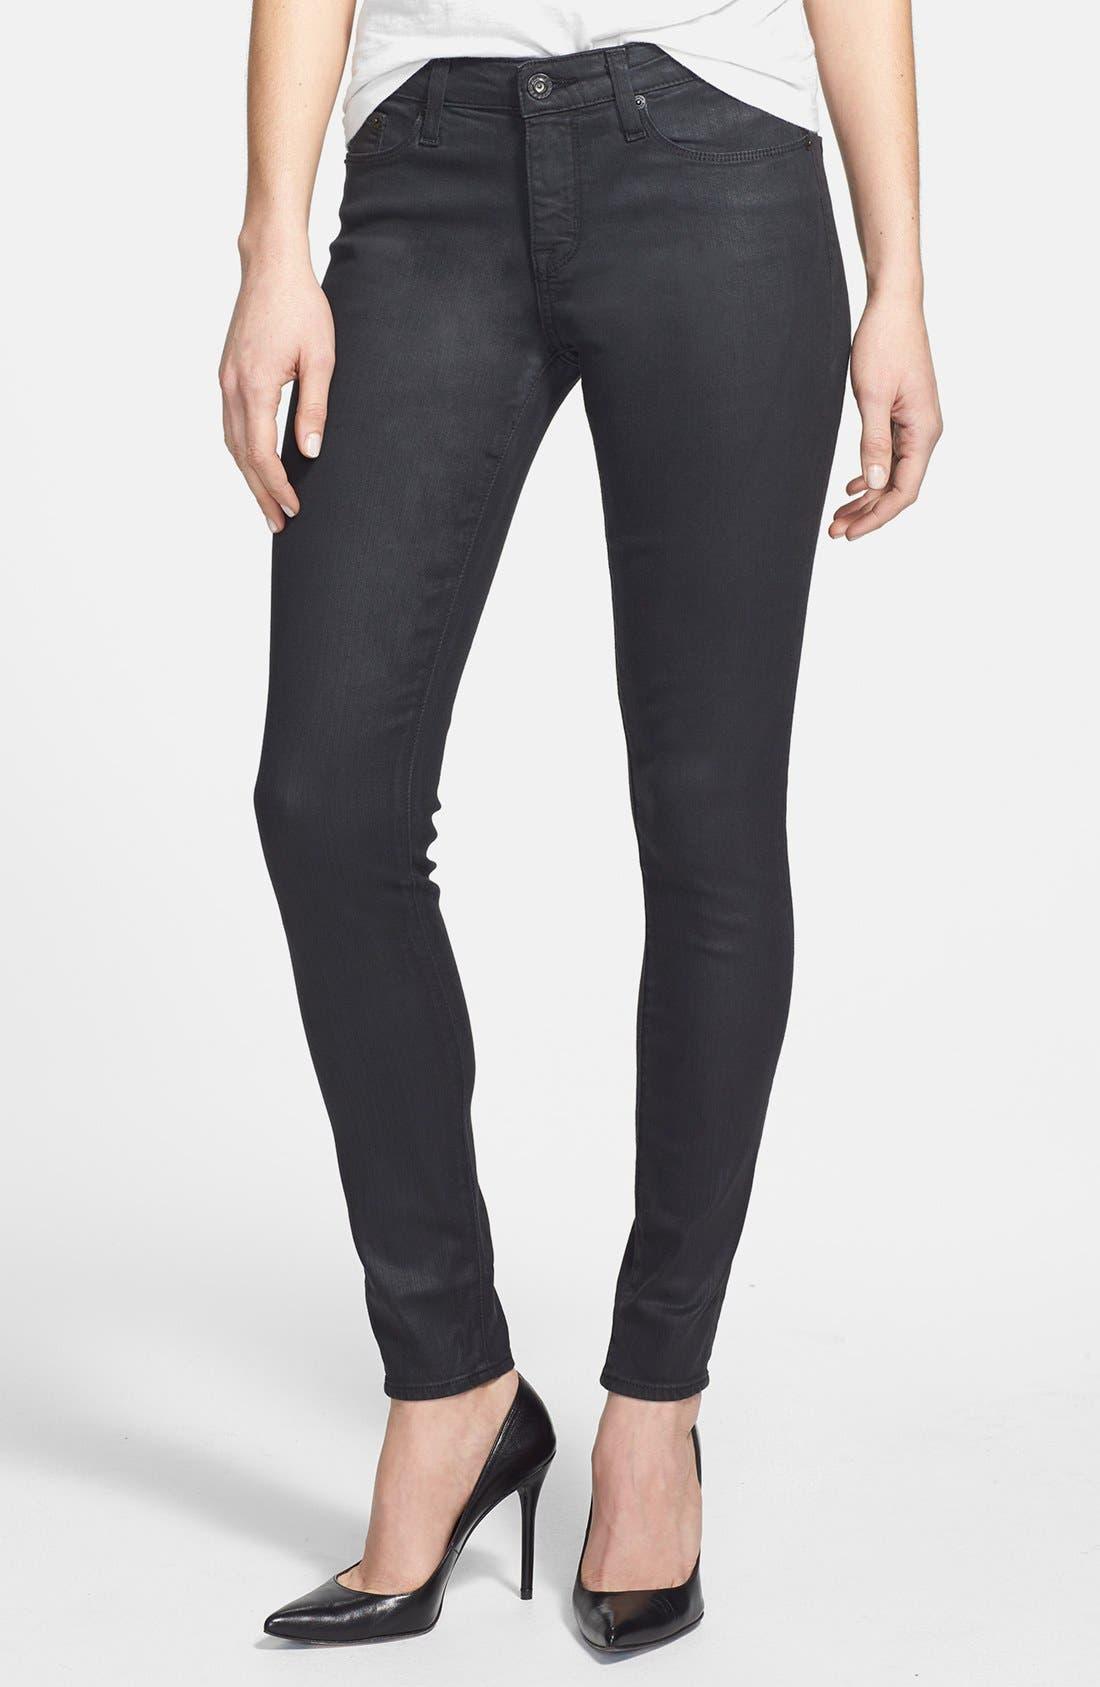 Alternate Image 1 Selected - Big Star 'Alex' Skinny Jeans (Gotham) (Petite)